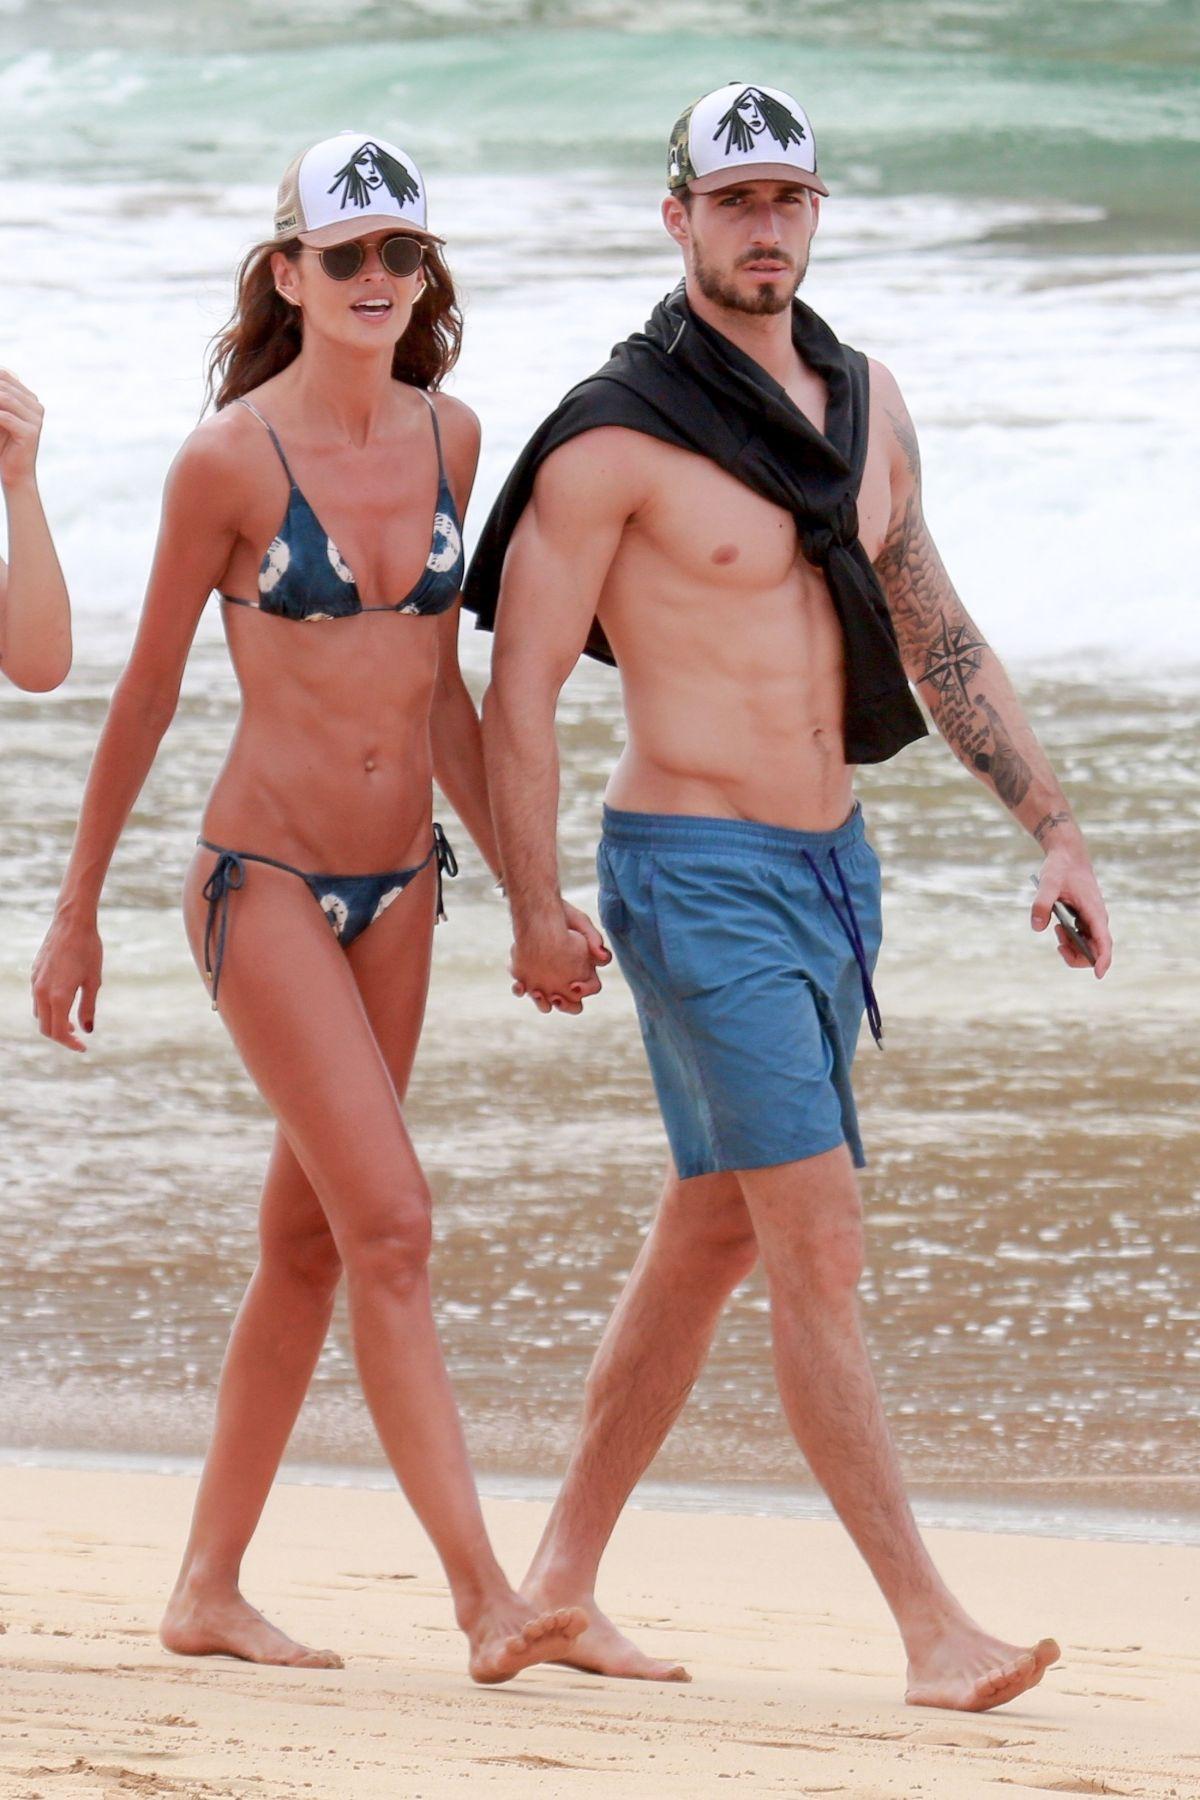 Izabel Goulart in Bikini and Kevin Trapp on the beach in Fernando de Noronha Pic 29 of 35